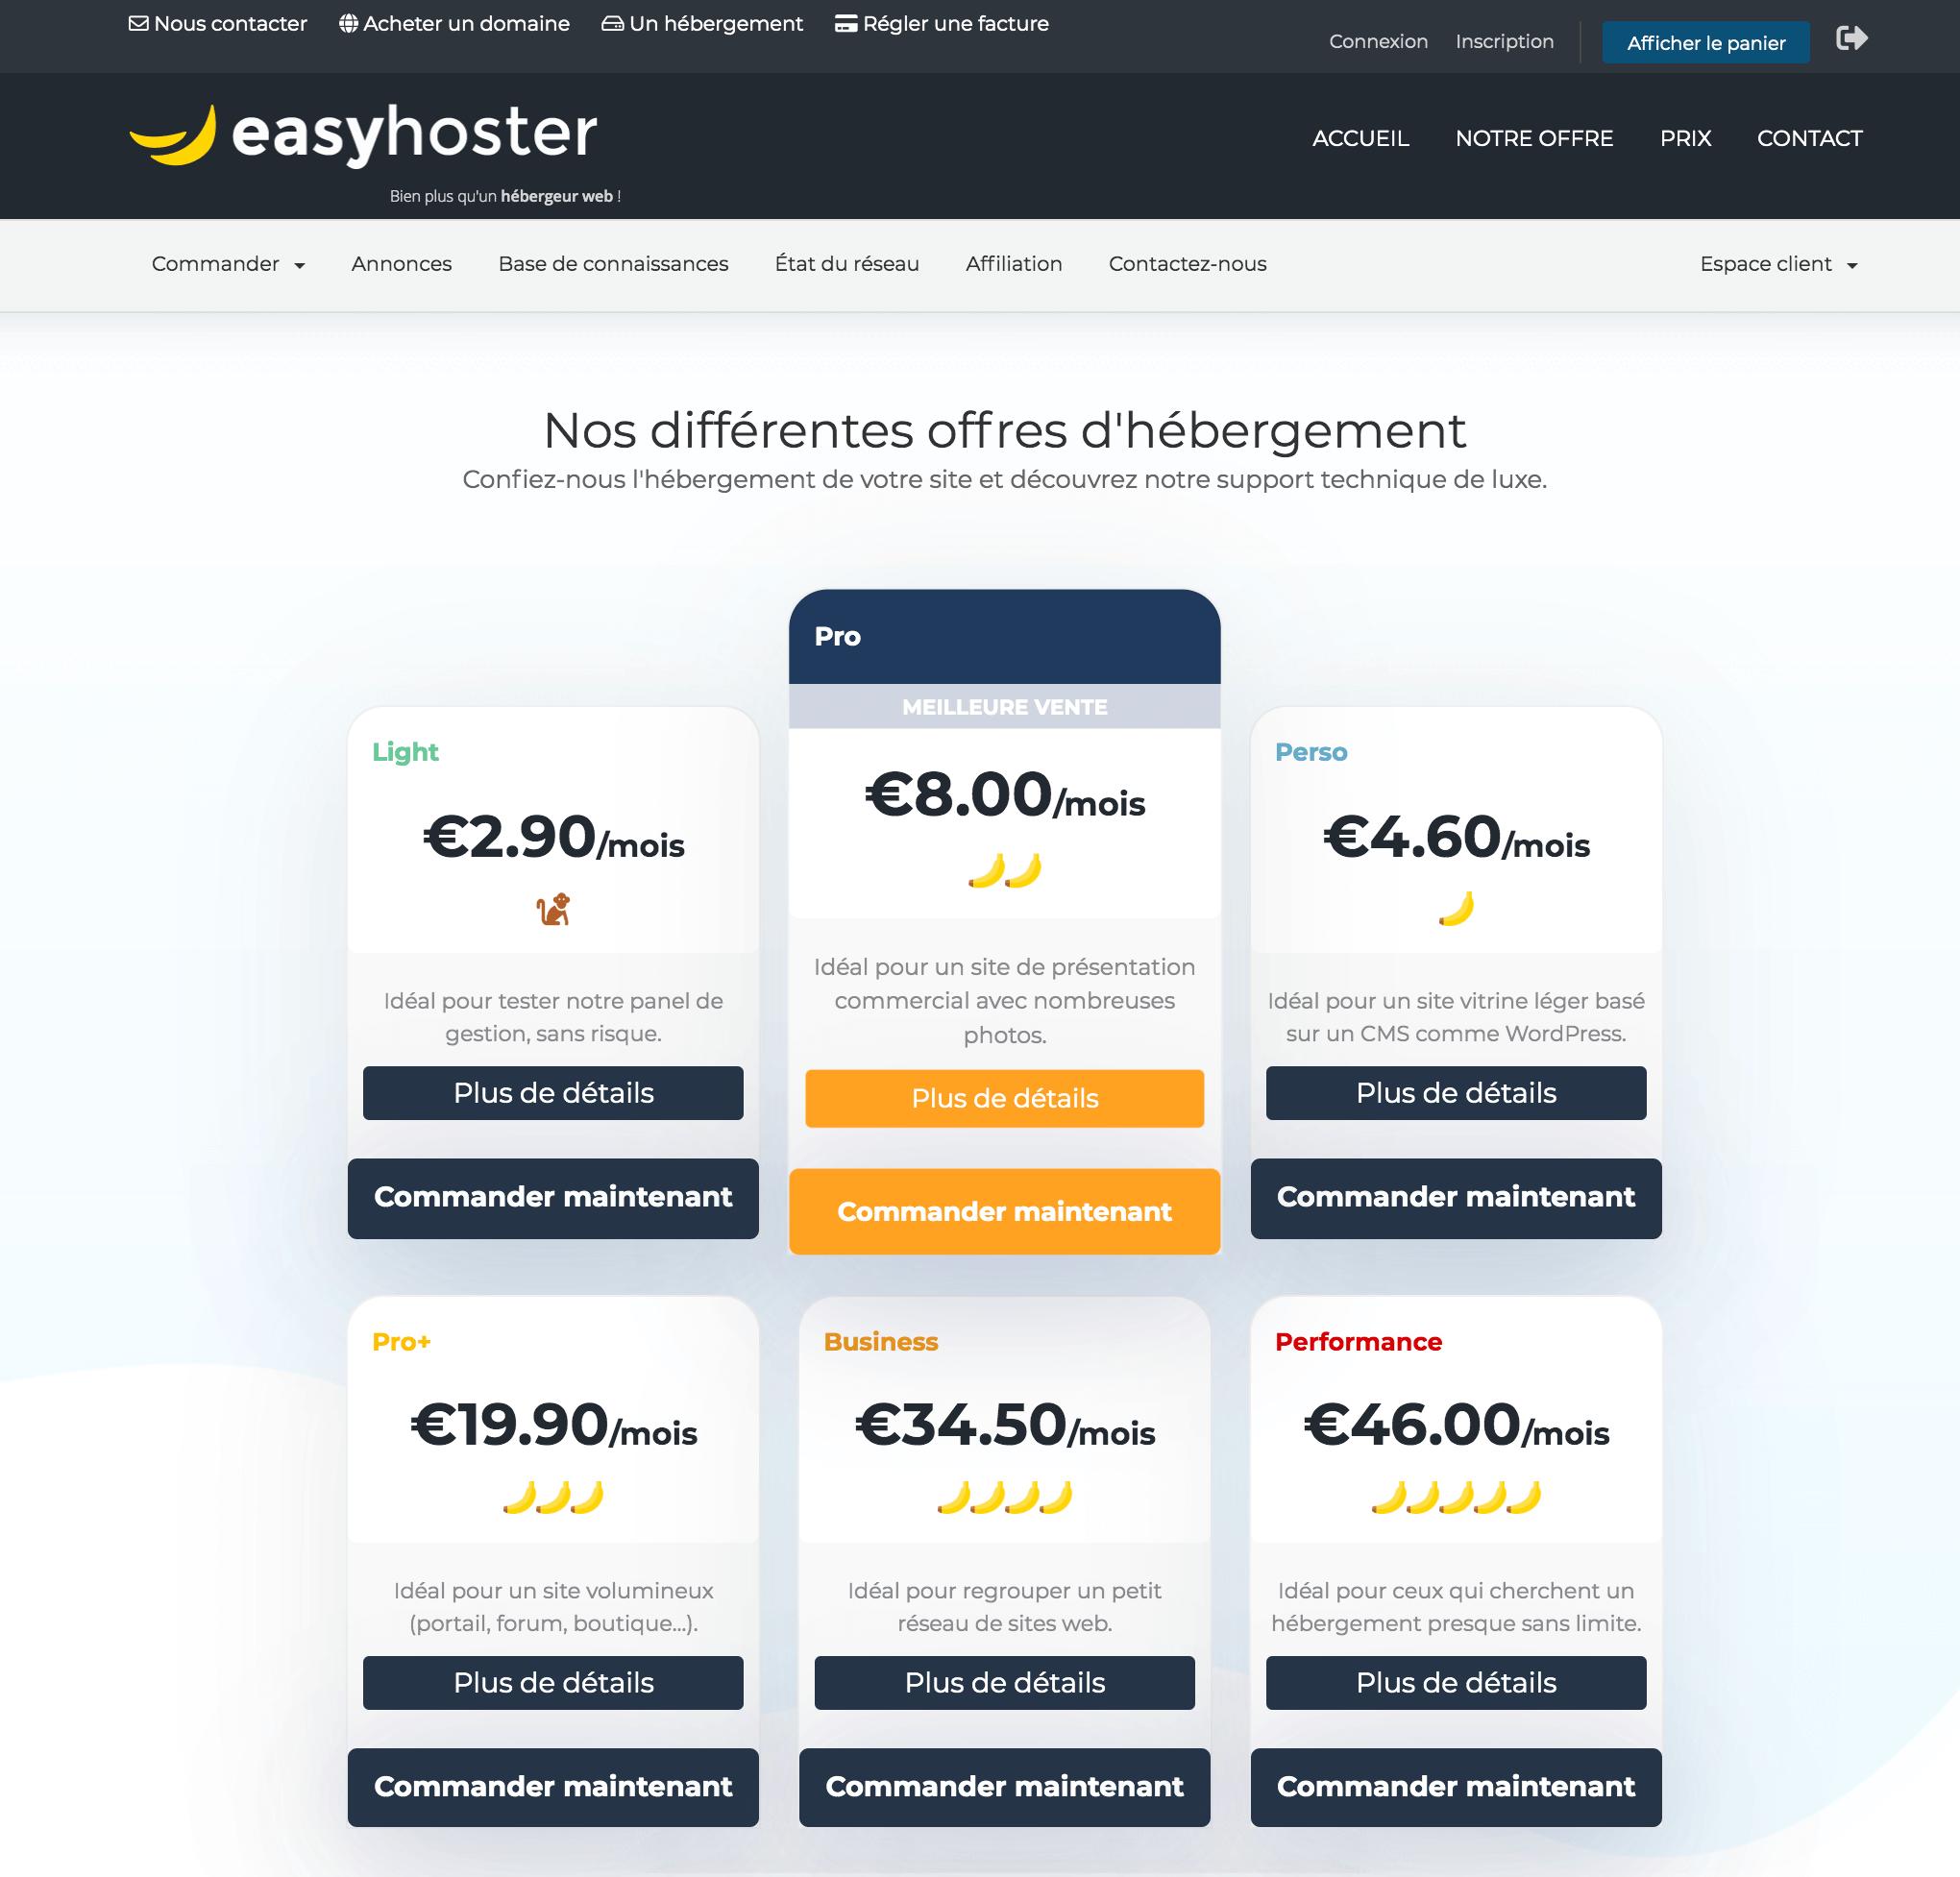 EasyHoster prix, EasyHoster tarif